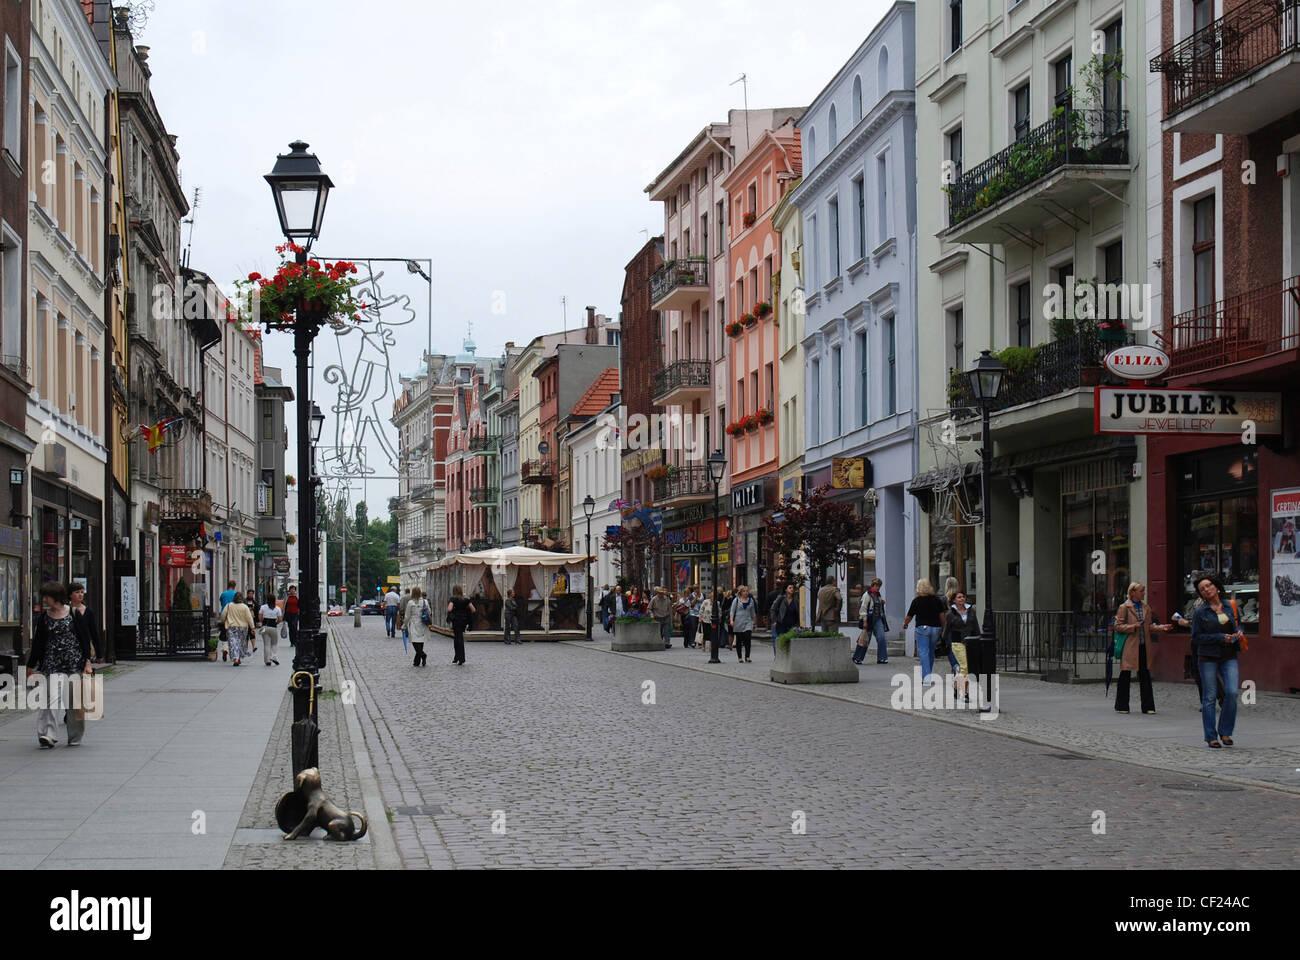 Pedestrian precinct in the old town of Torun. - Stock Image